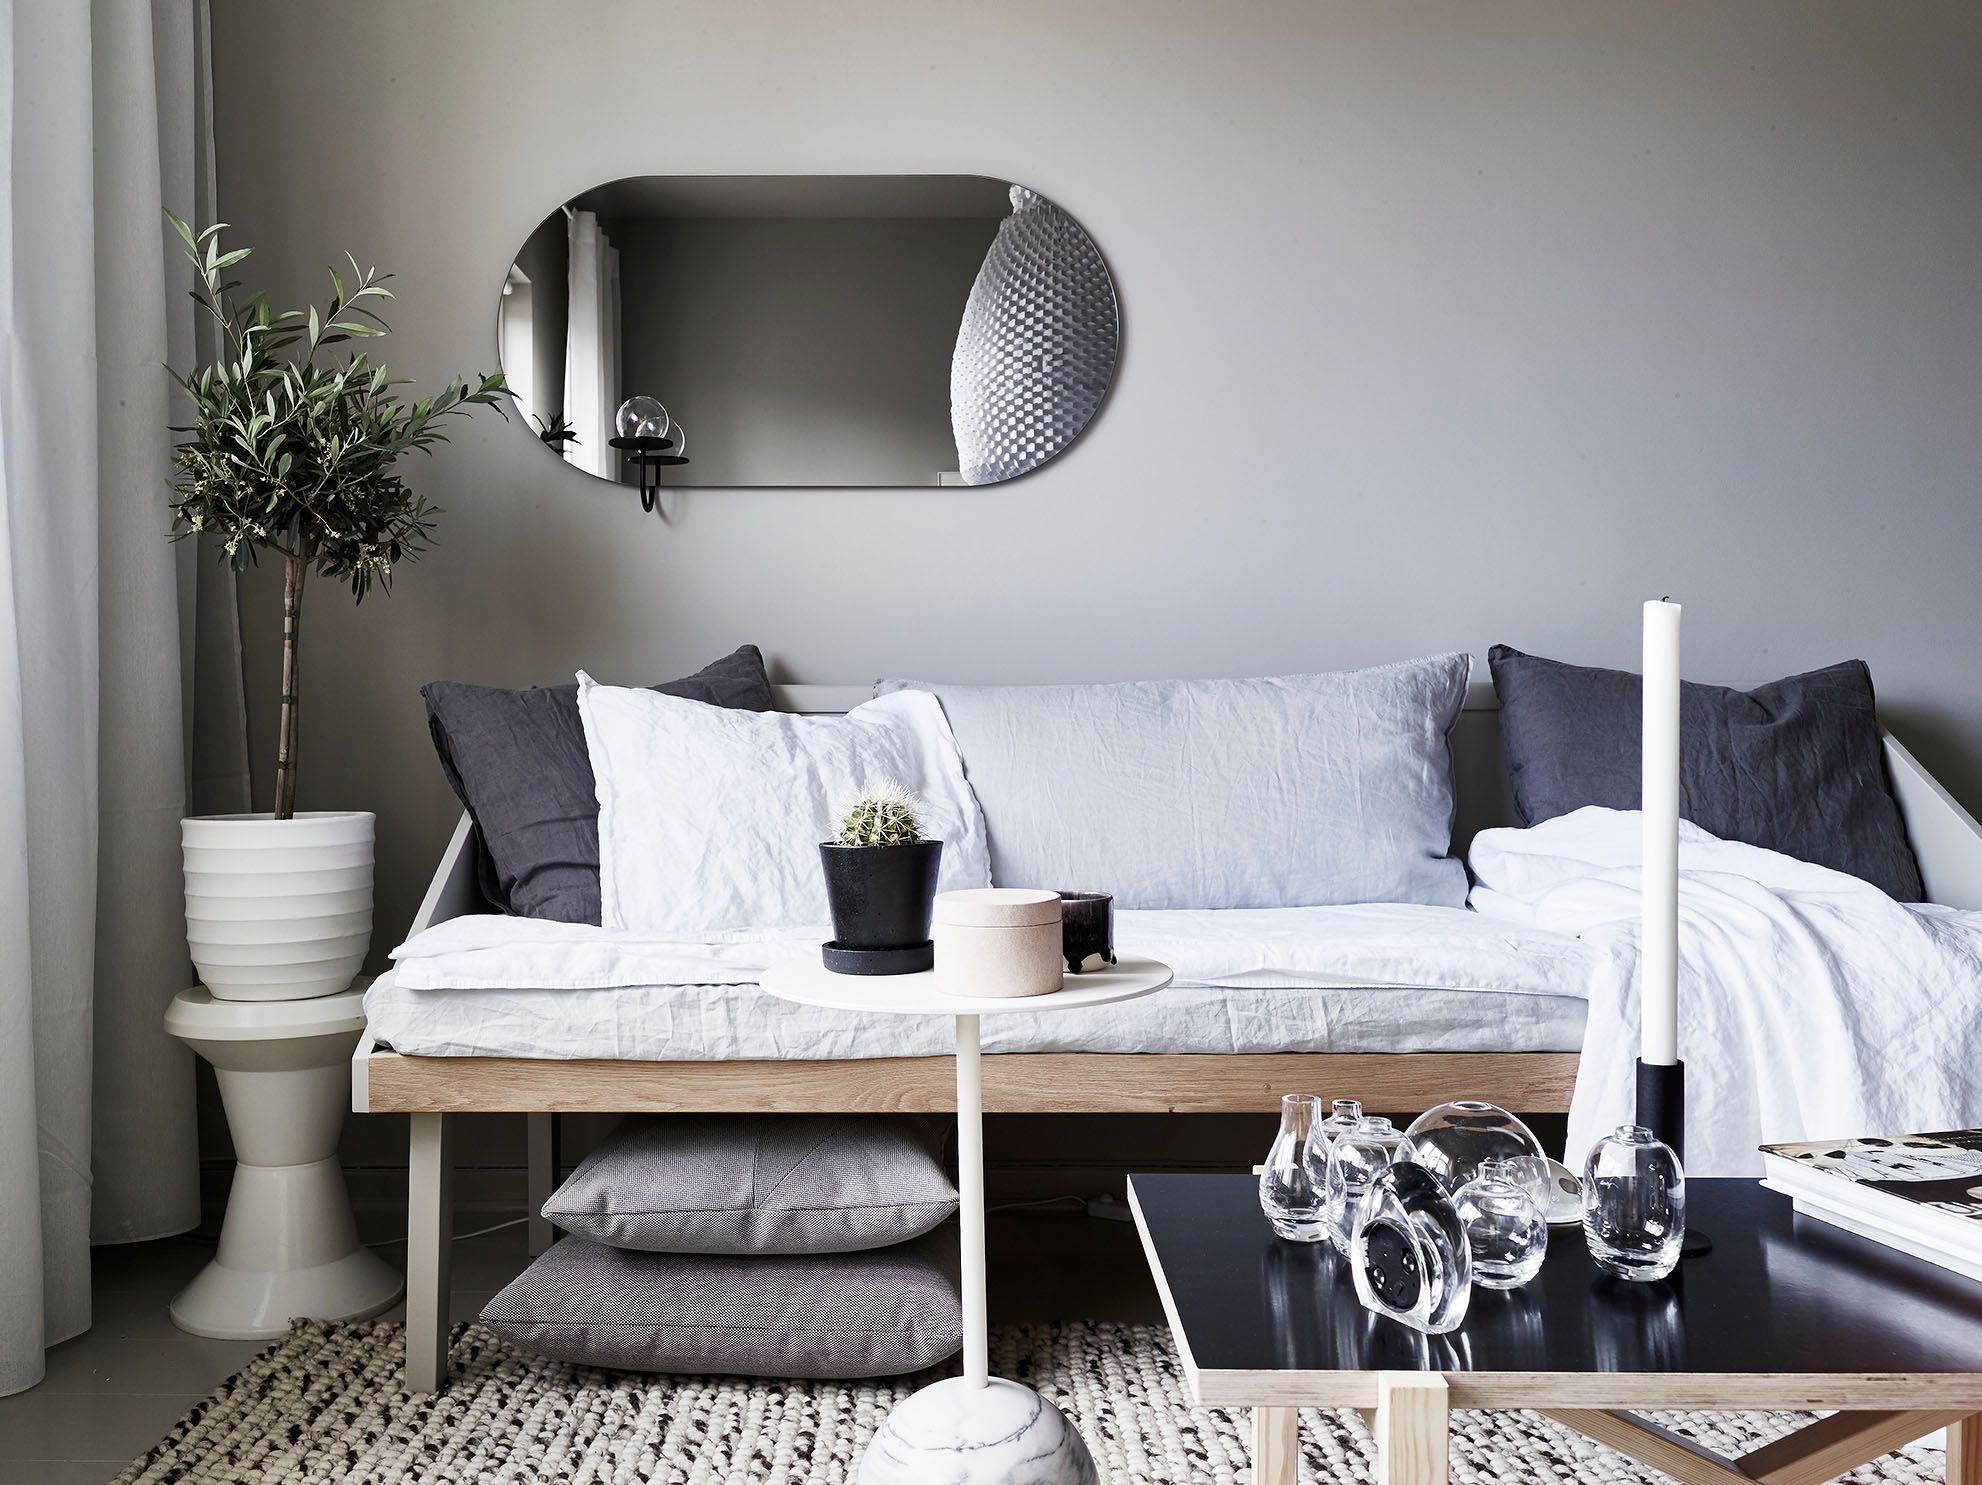 Greys all around